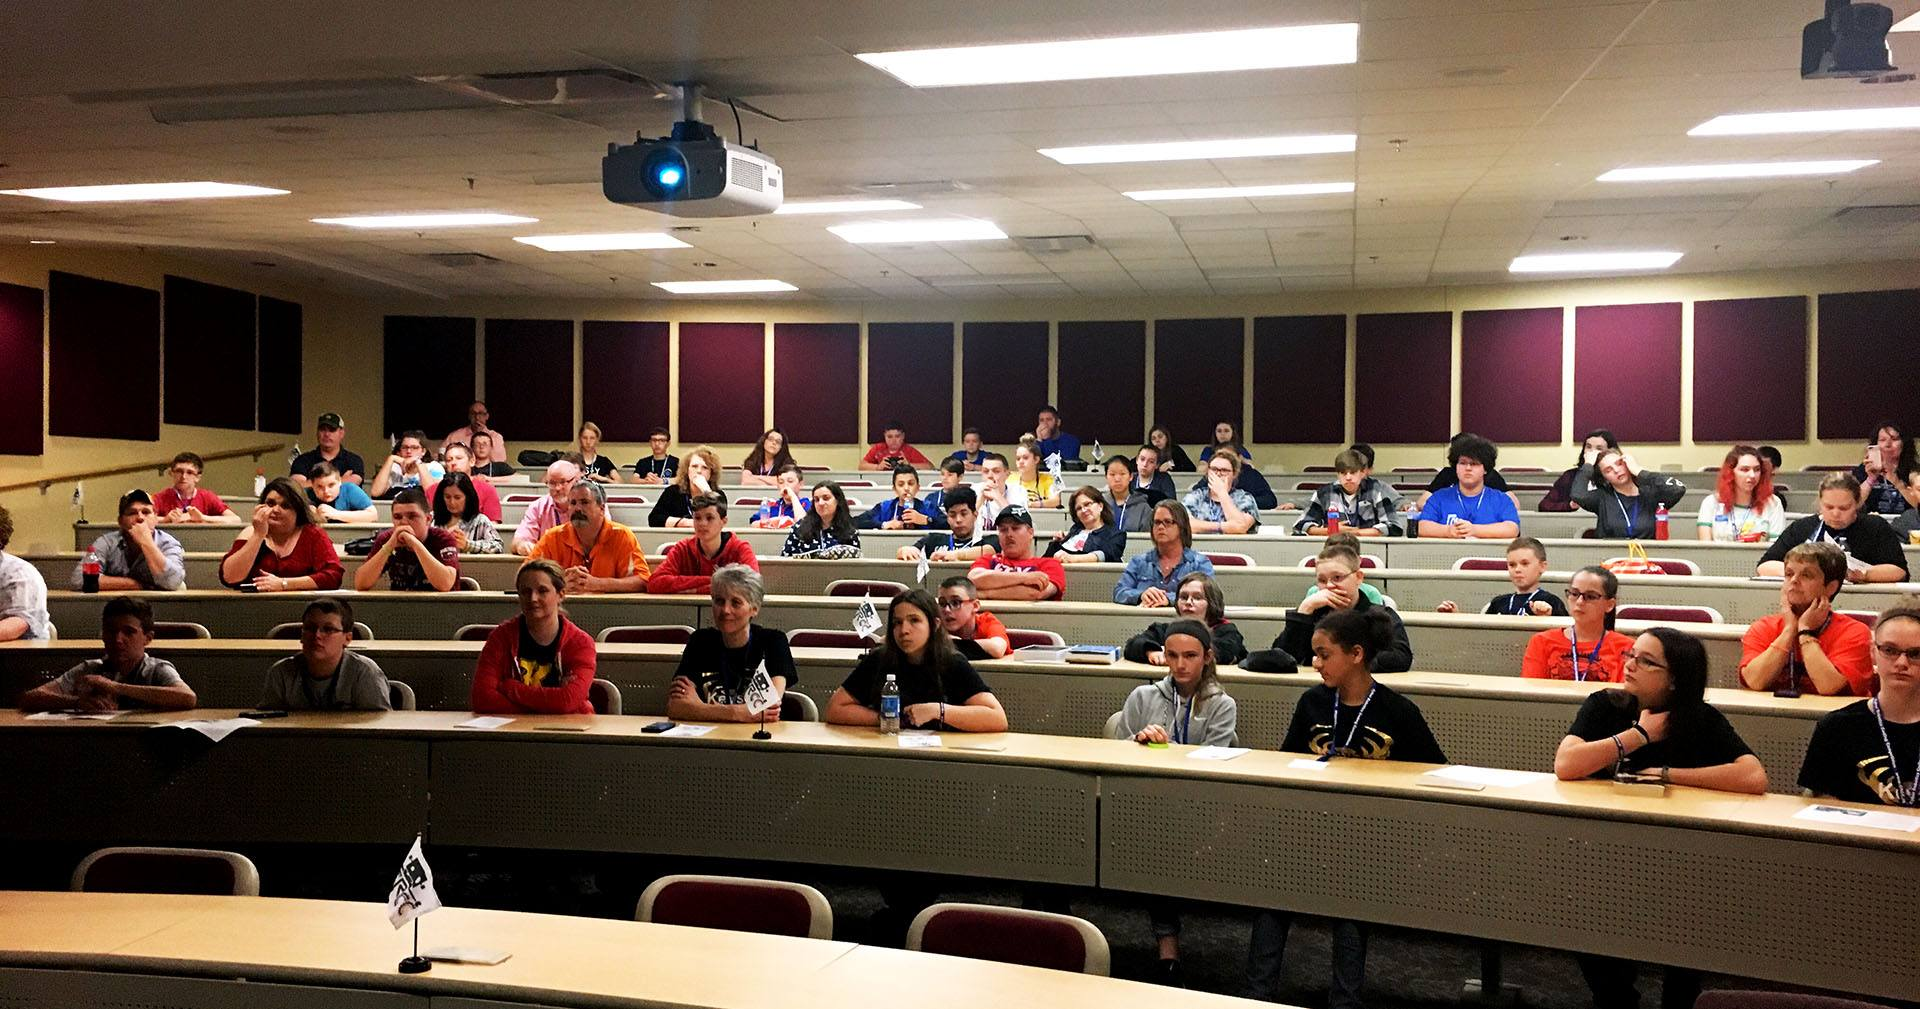 students at crcc wv - coderZ STEM Blog